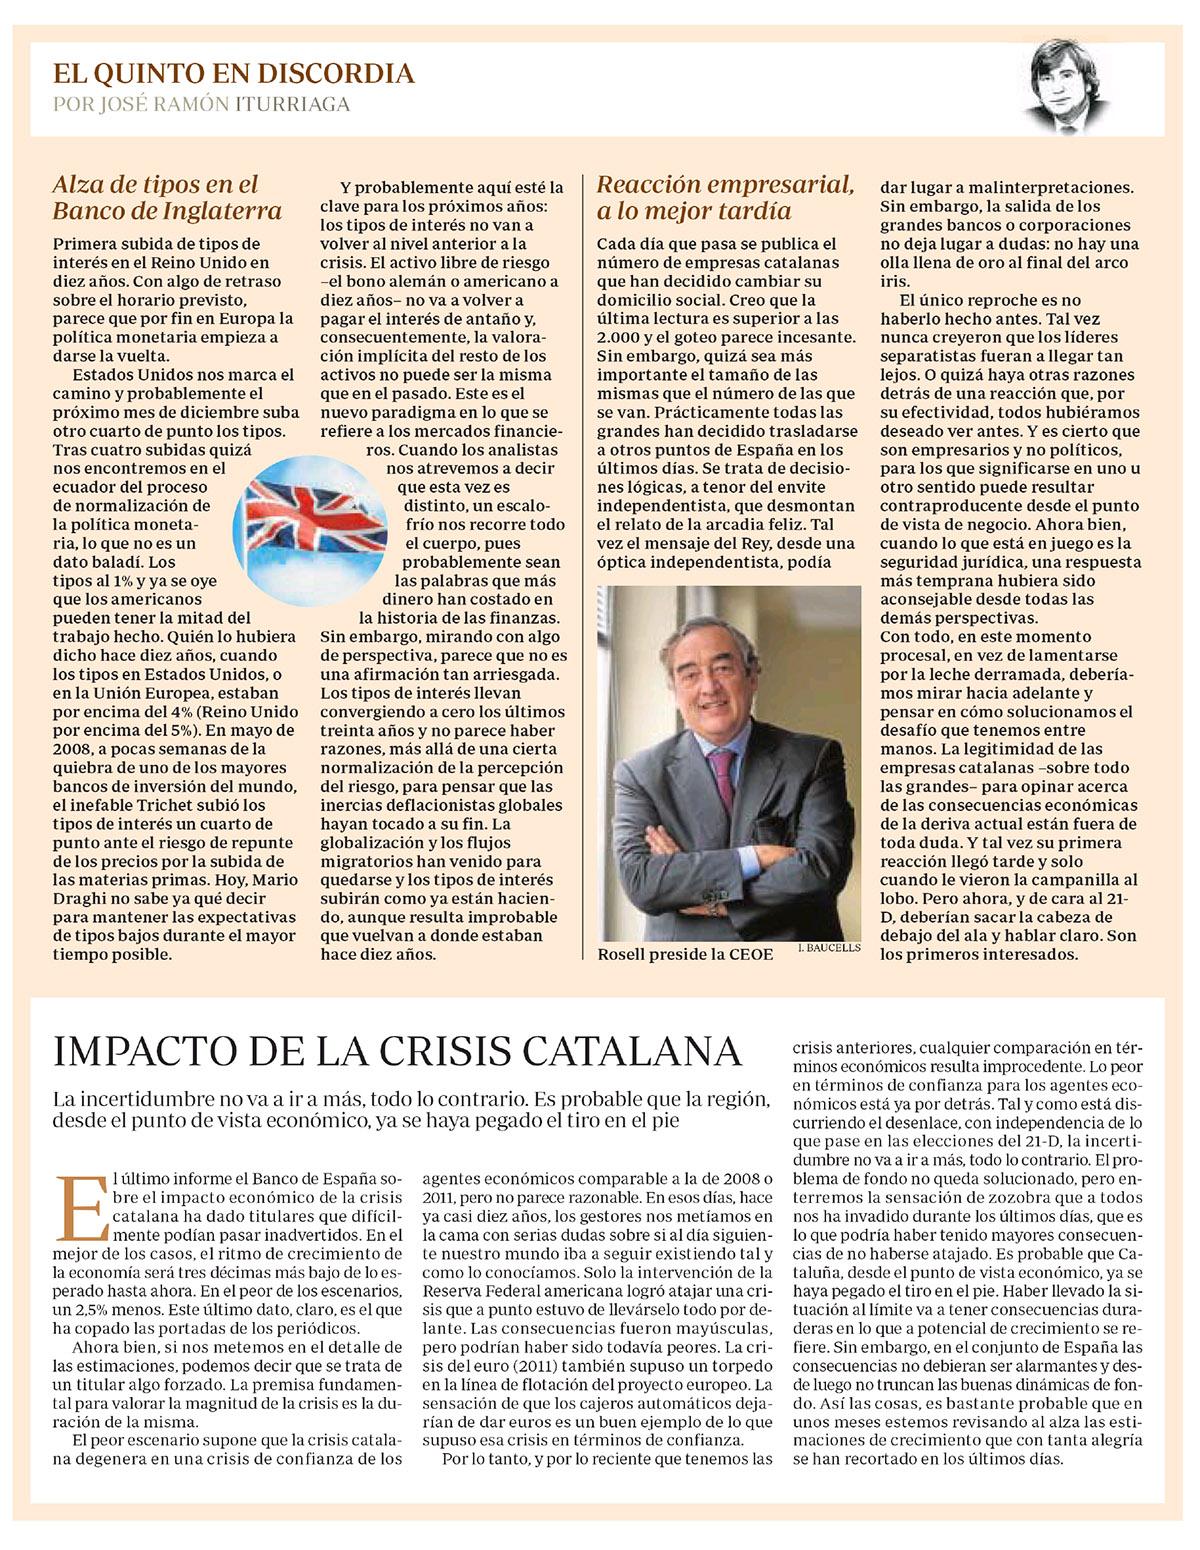 ABC Iturriaga EQED tipos Inglaterra y crisis catalana